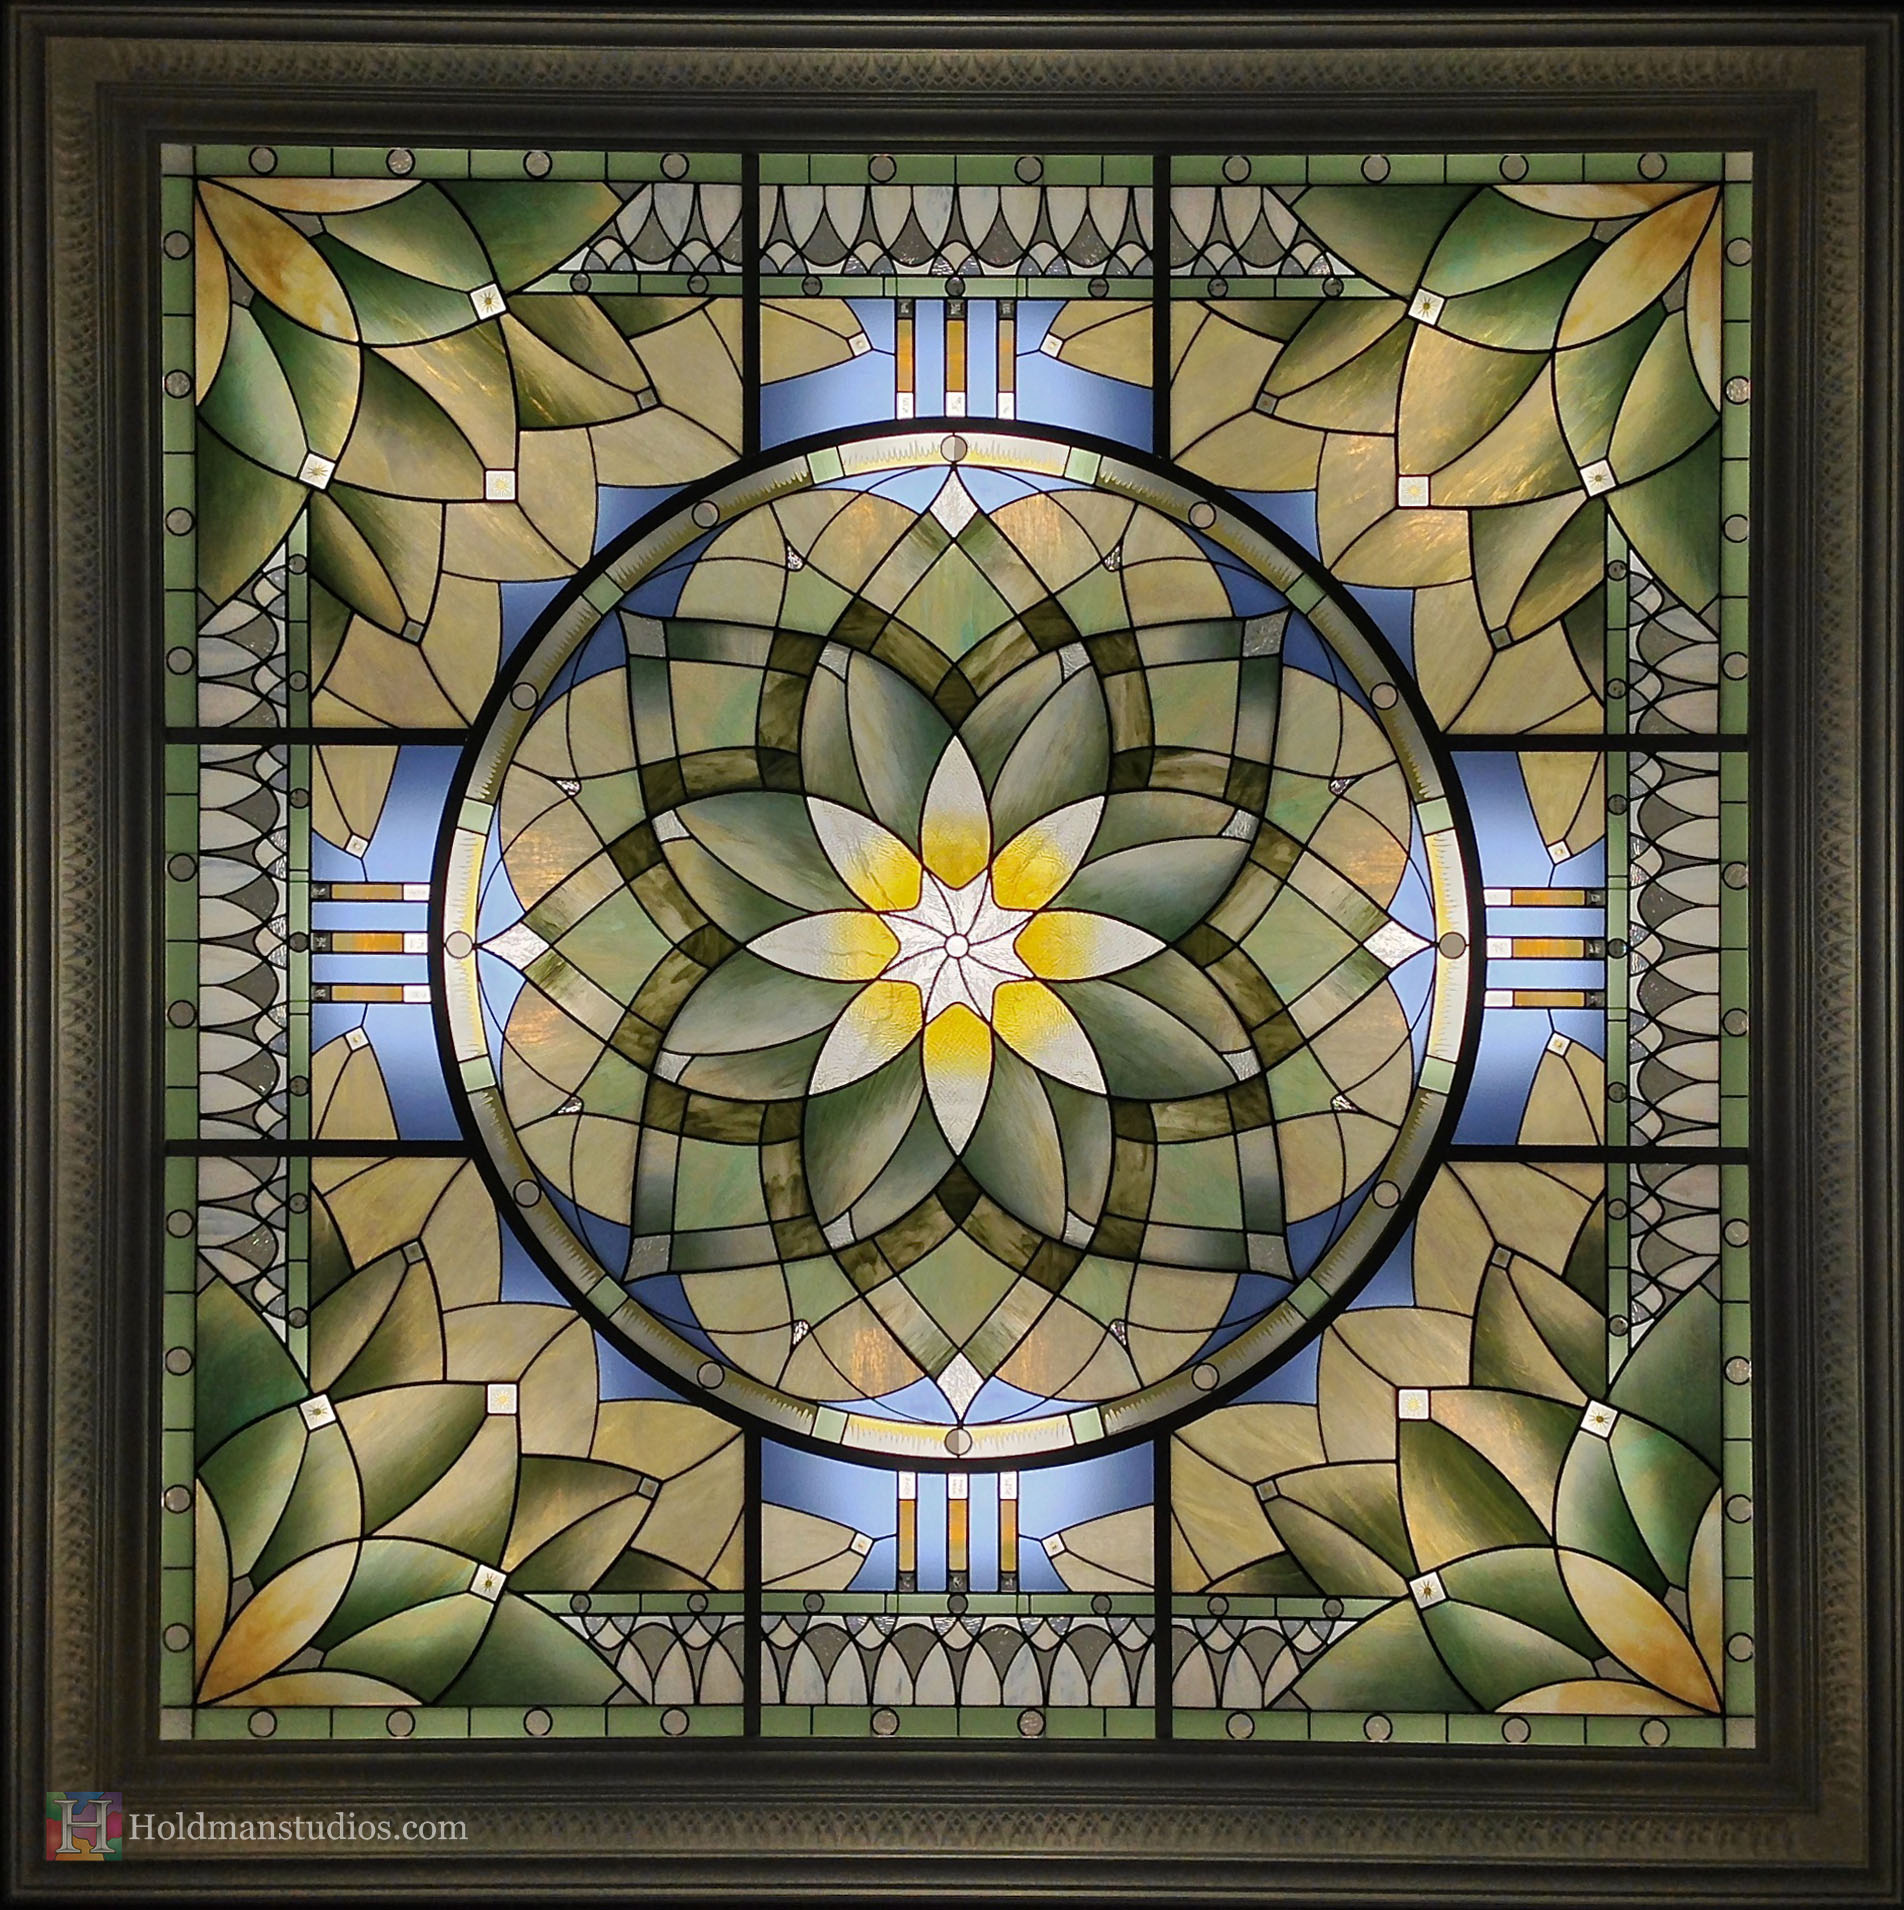 Holdman_Studios_Stained_Art_Glass_LDS_Mormon_Temple_Gilbert_Arizona_Agave_Plant_Marriage_Waitingroom_Skylight.jpg